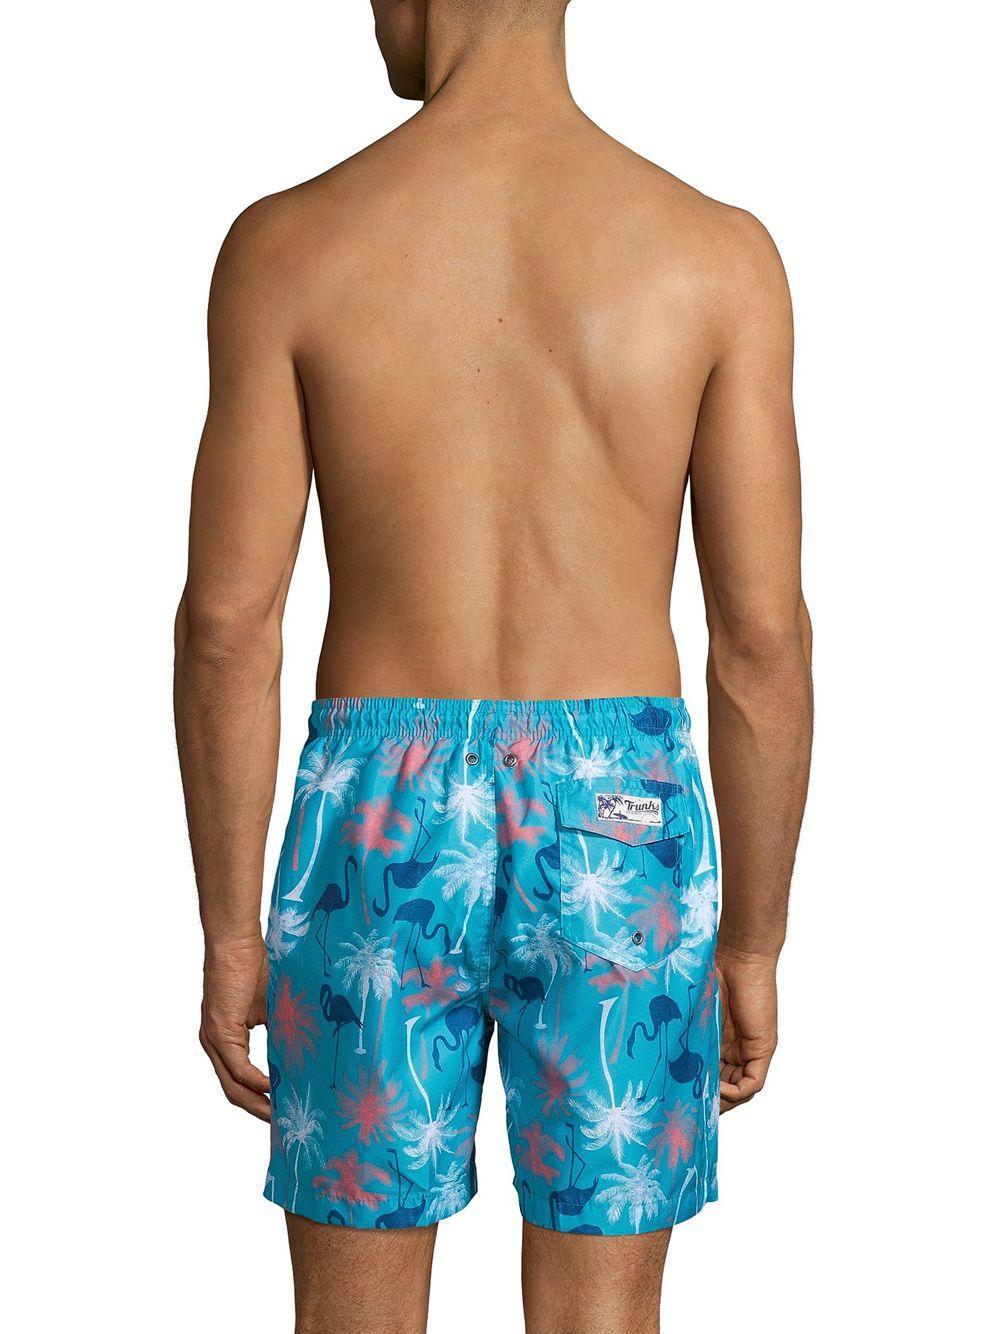 061c31cbe2 Onia - Blue Printed Swim Shorts for Men - Lyst. View fullscreen